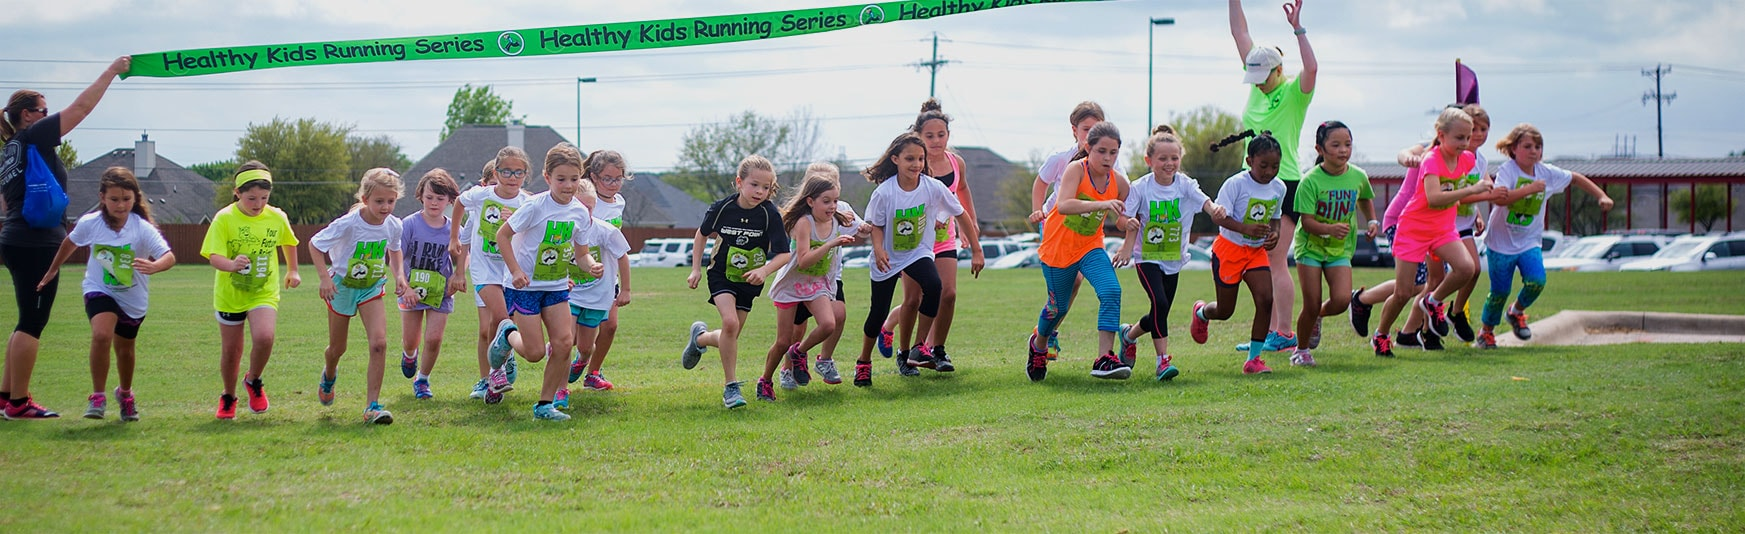 Healthy Kids Running Series East Brunswick NJ